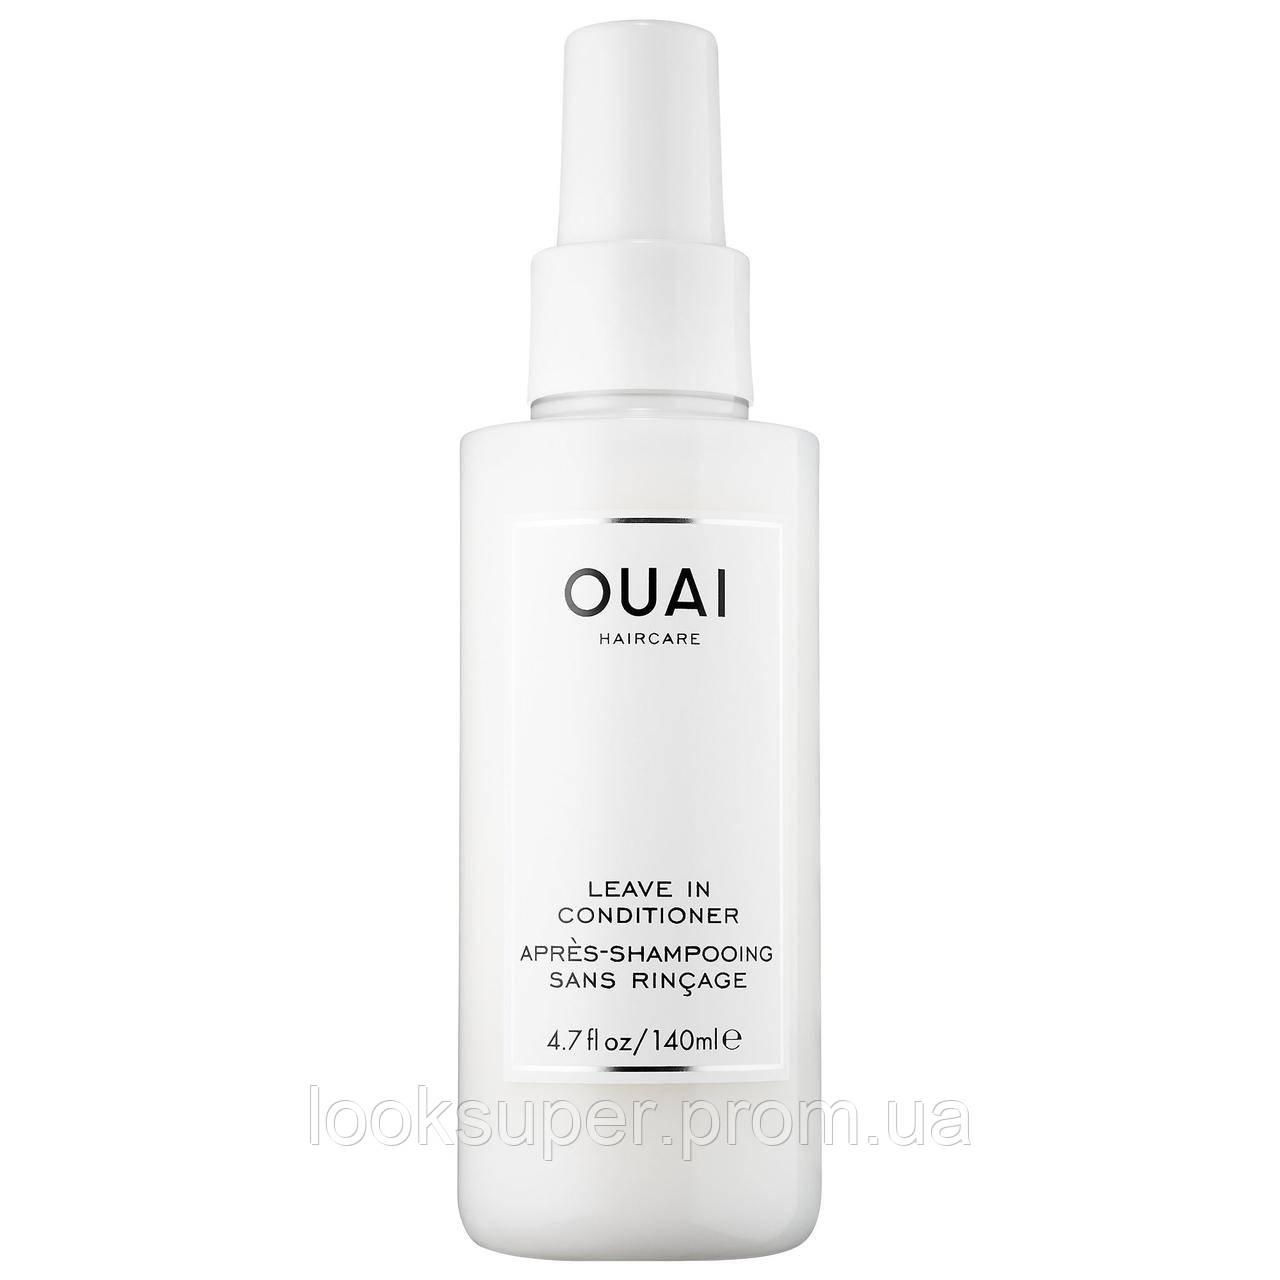 Кондиционер для волос OUAI Leave-In Conditioner  140ml